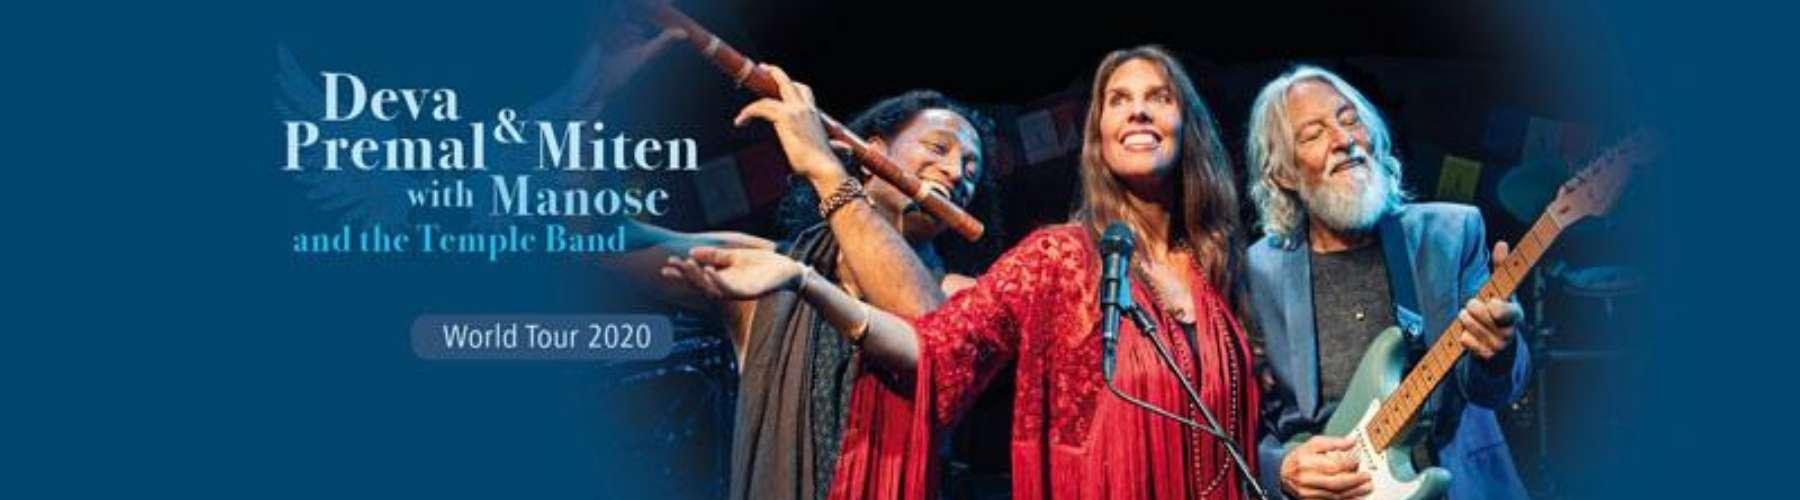 Deva Premal - Konzert